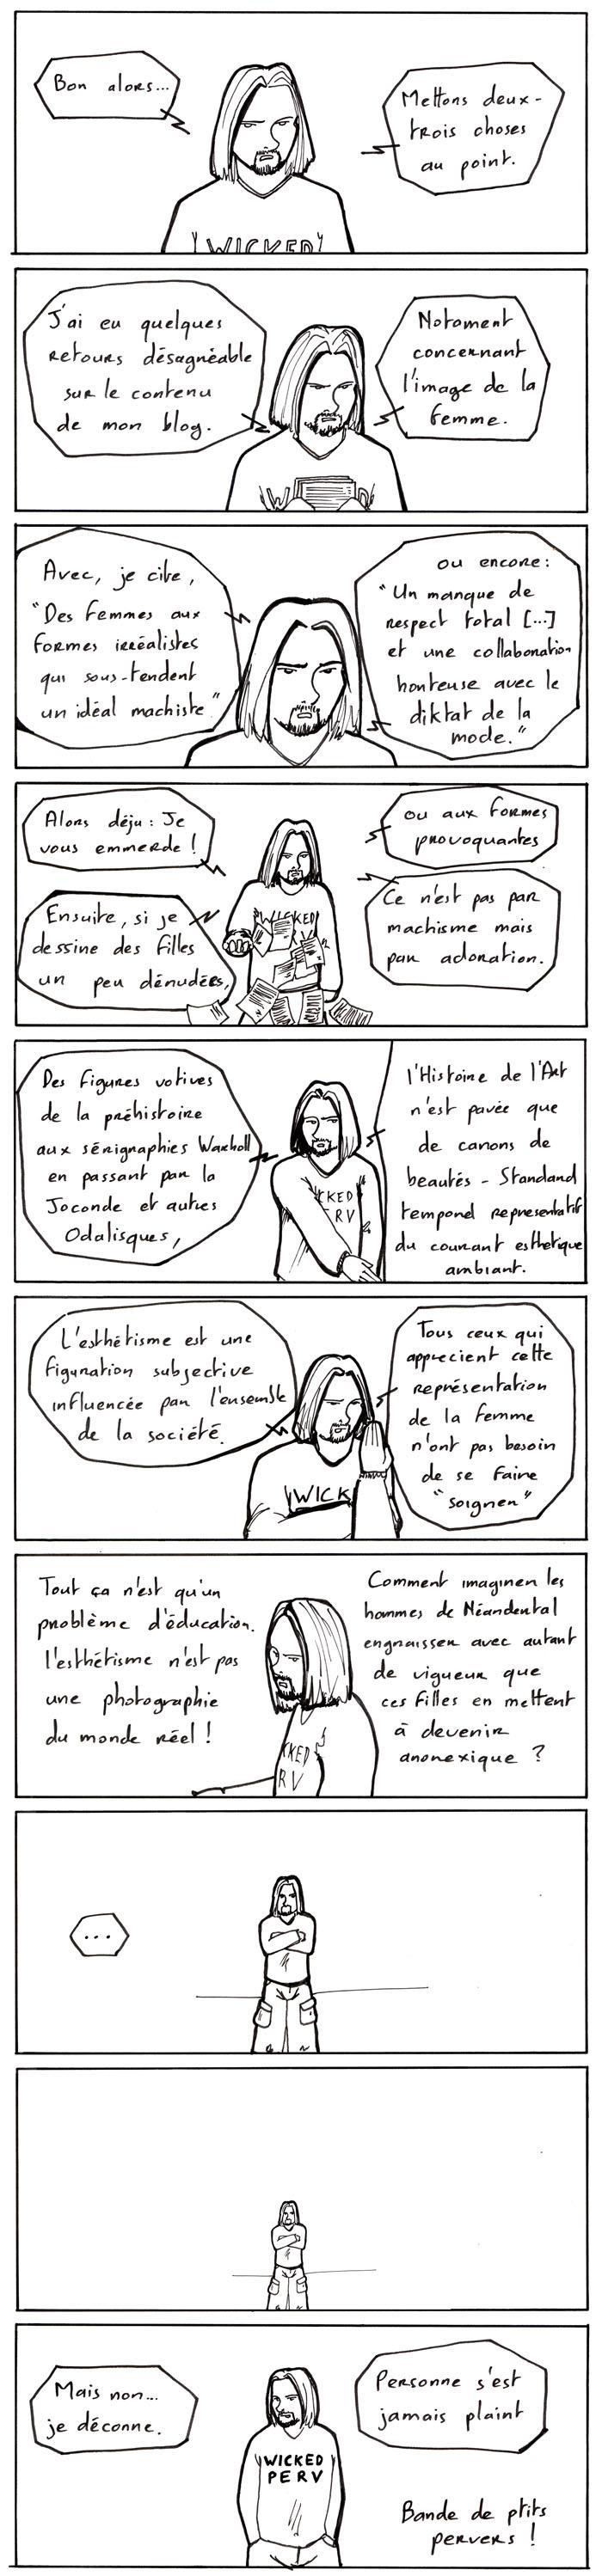 http://bjouen.free.fr/dessins/plaintes%20011.jpg